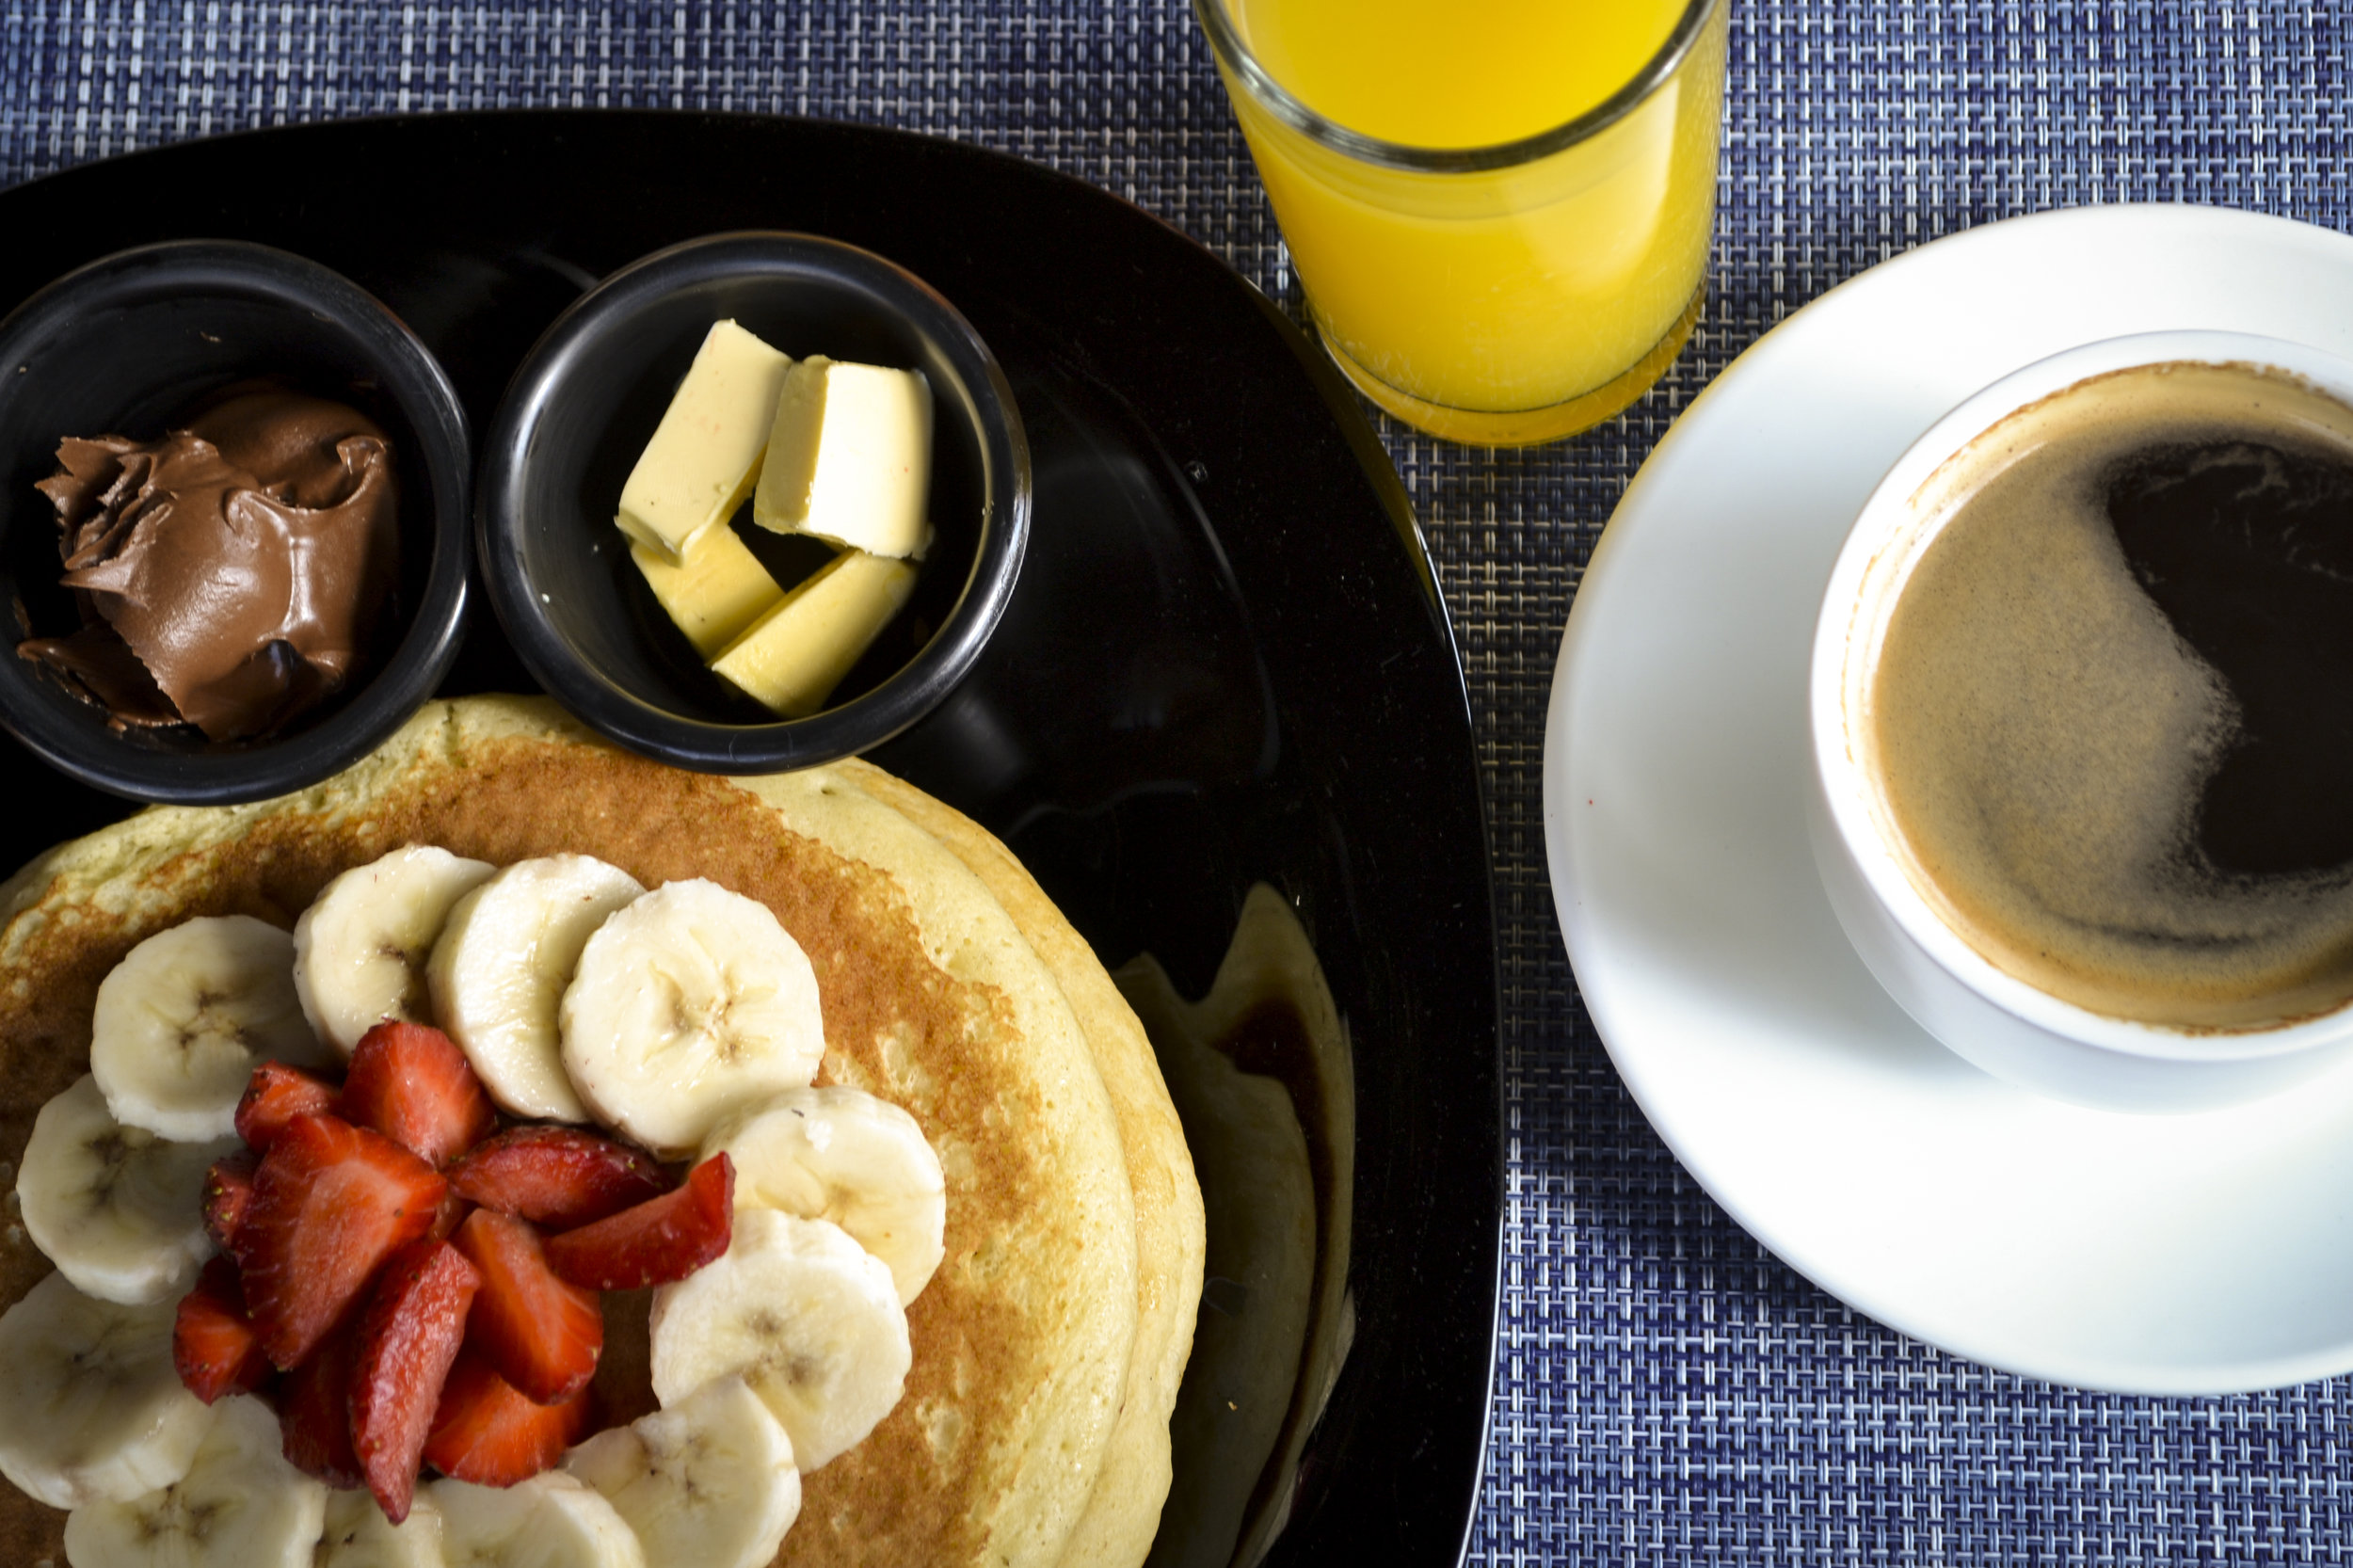 desayuno2.jpg